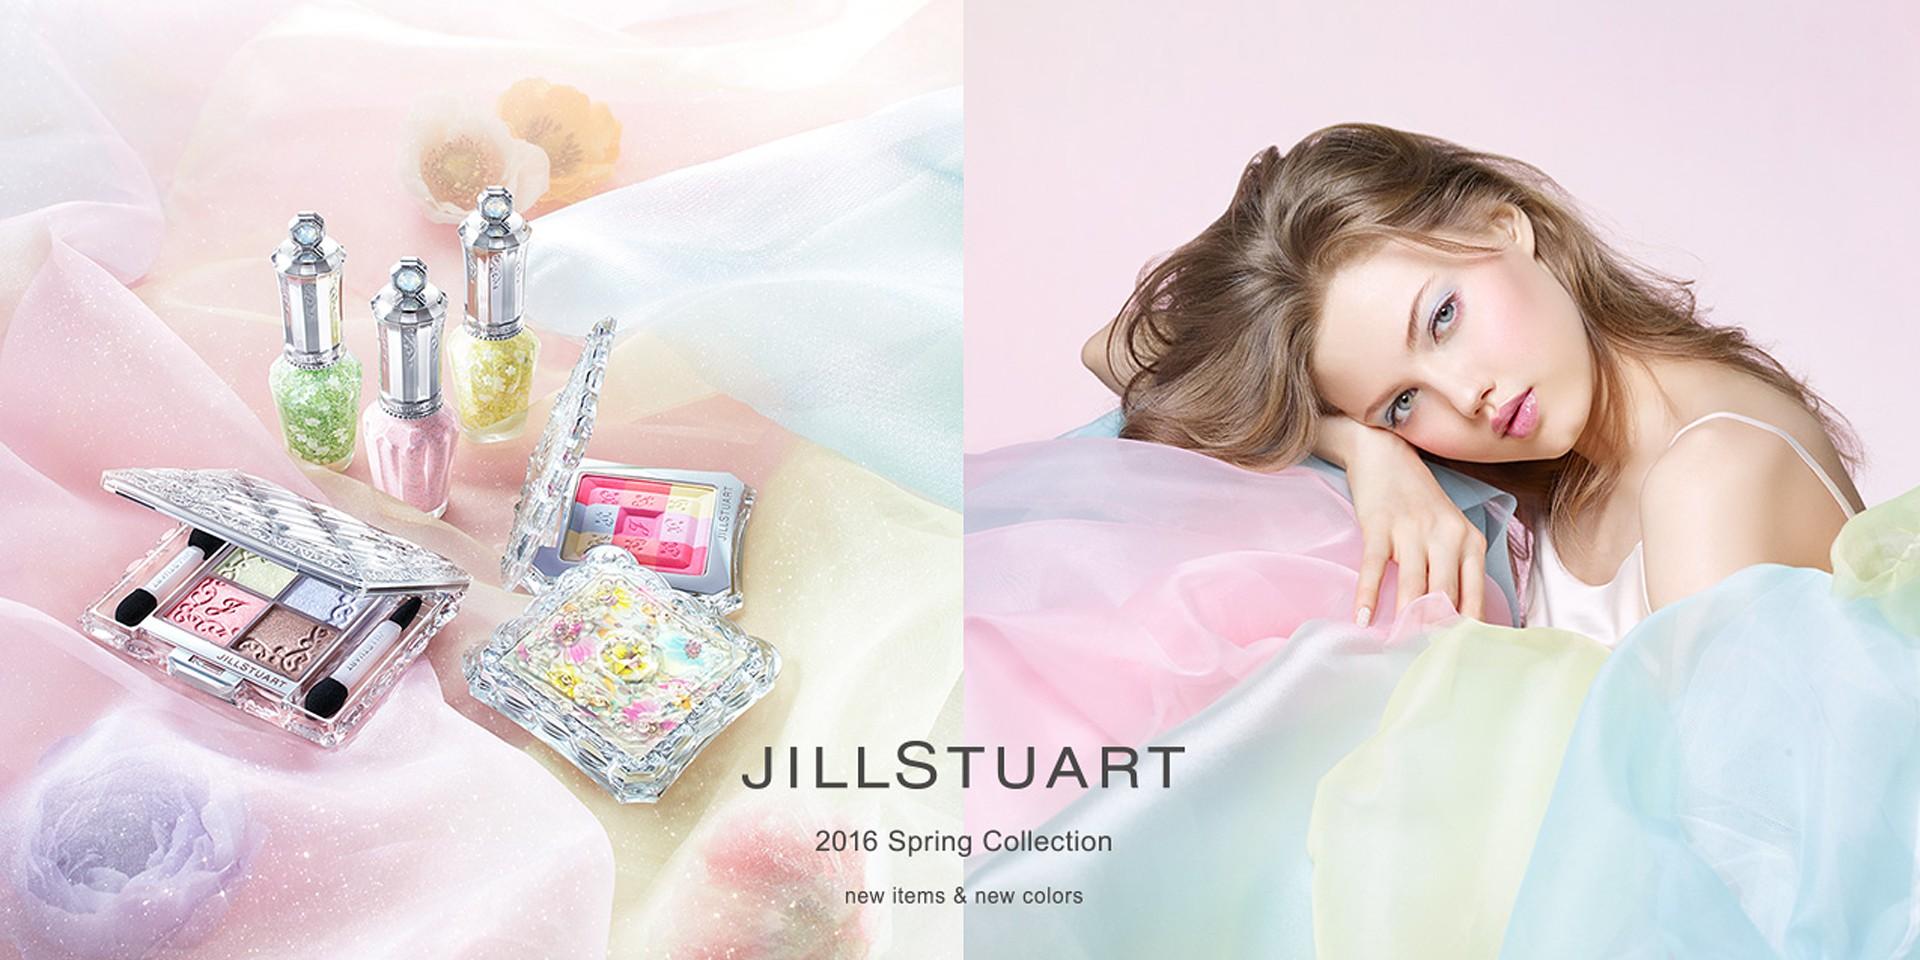 Jill Stuart เครื่องสำอางสไตล์เจ้าหญิงสุดฟรุ้งฟริ้งที่ใครๆก็อยากได้!